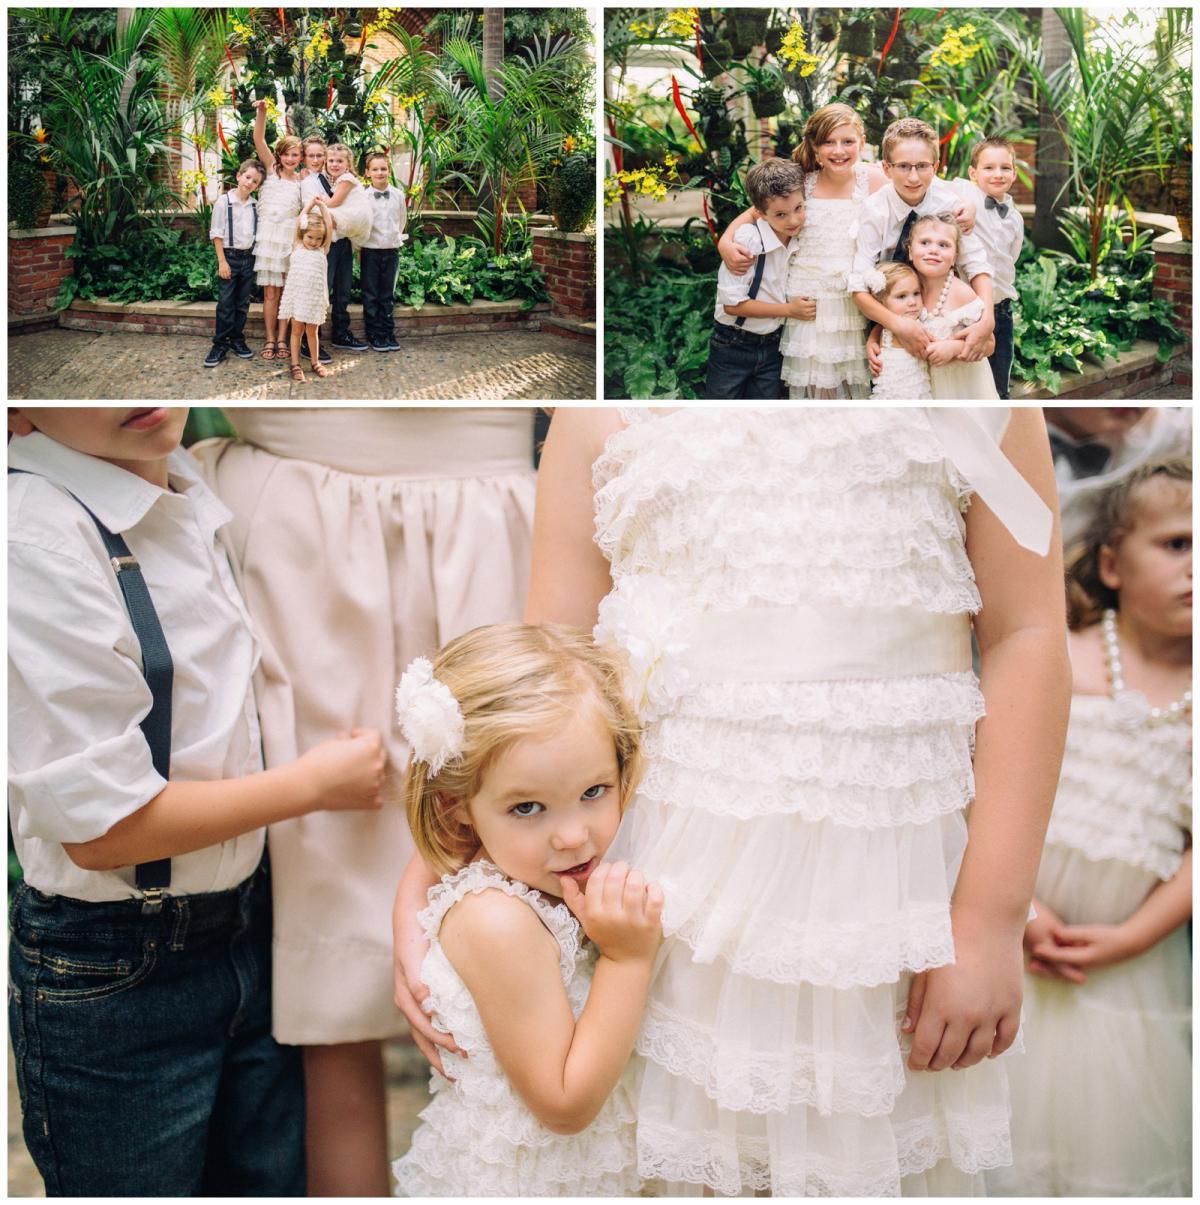 wild-native-photography-wedding-pittsburgh-phipps-blake45